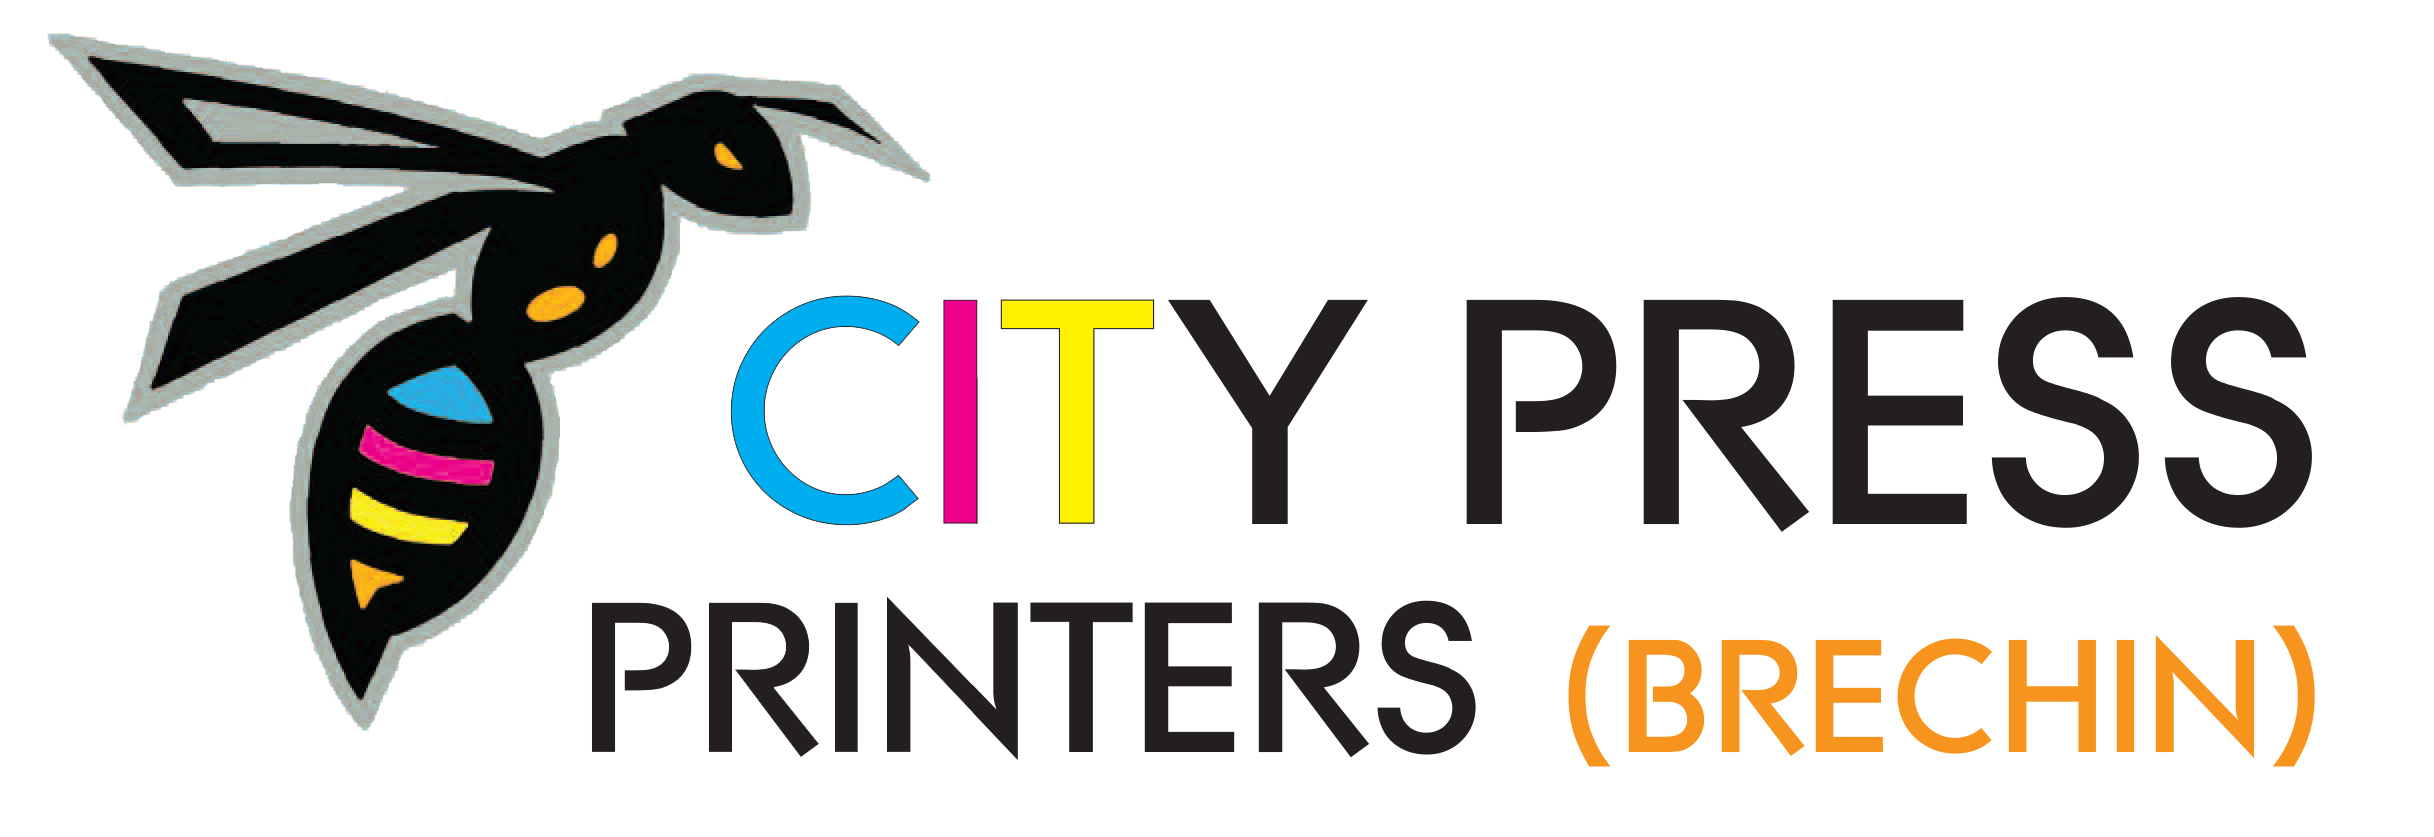 City Press Printers